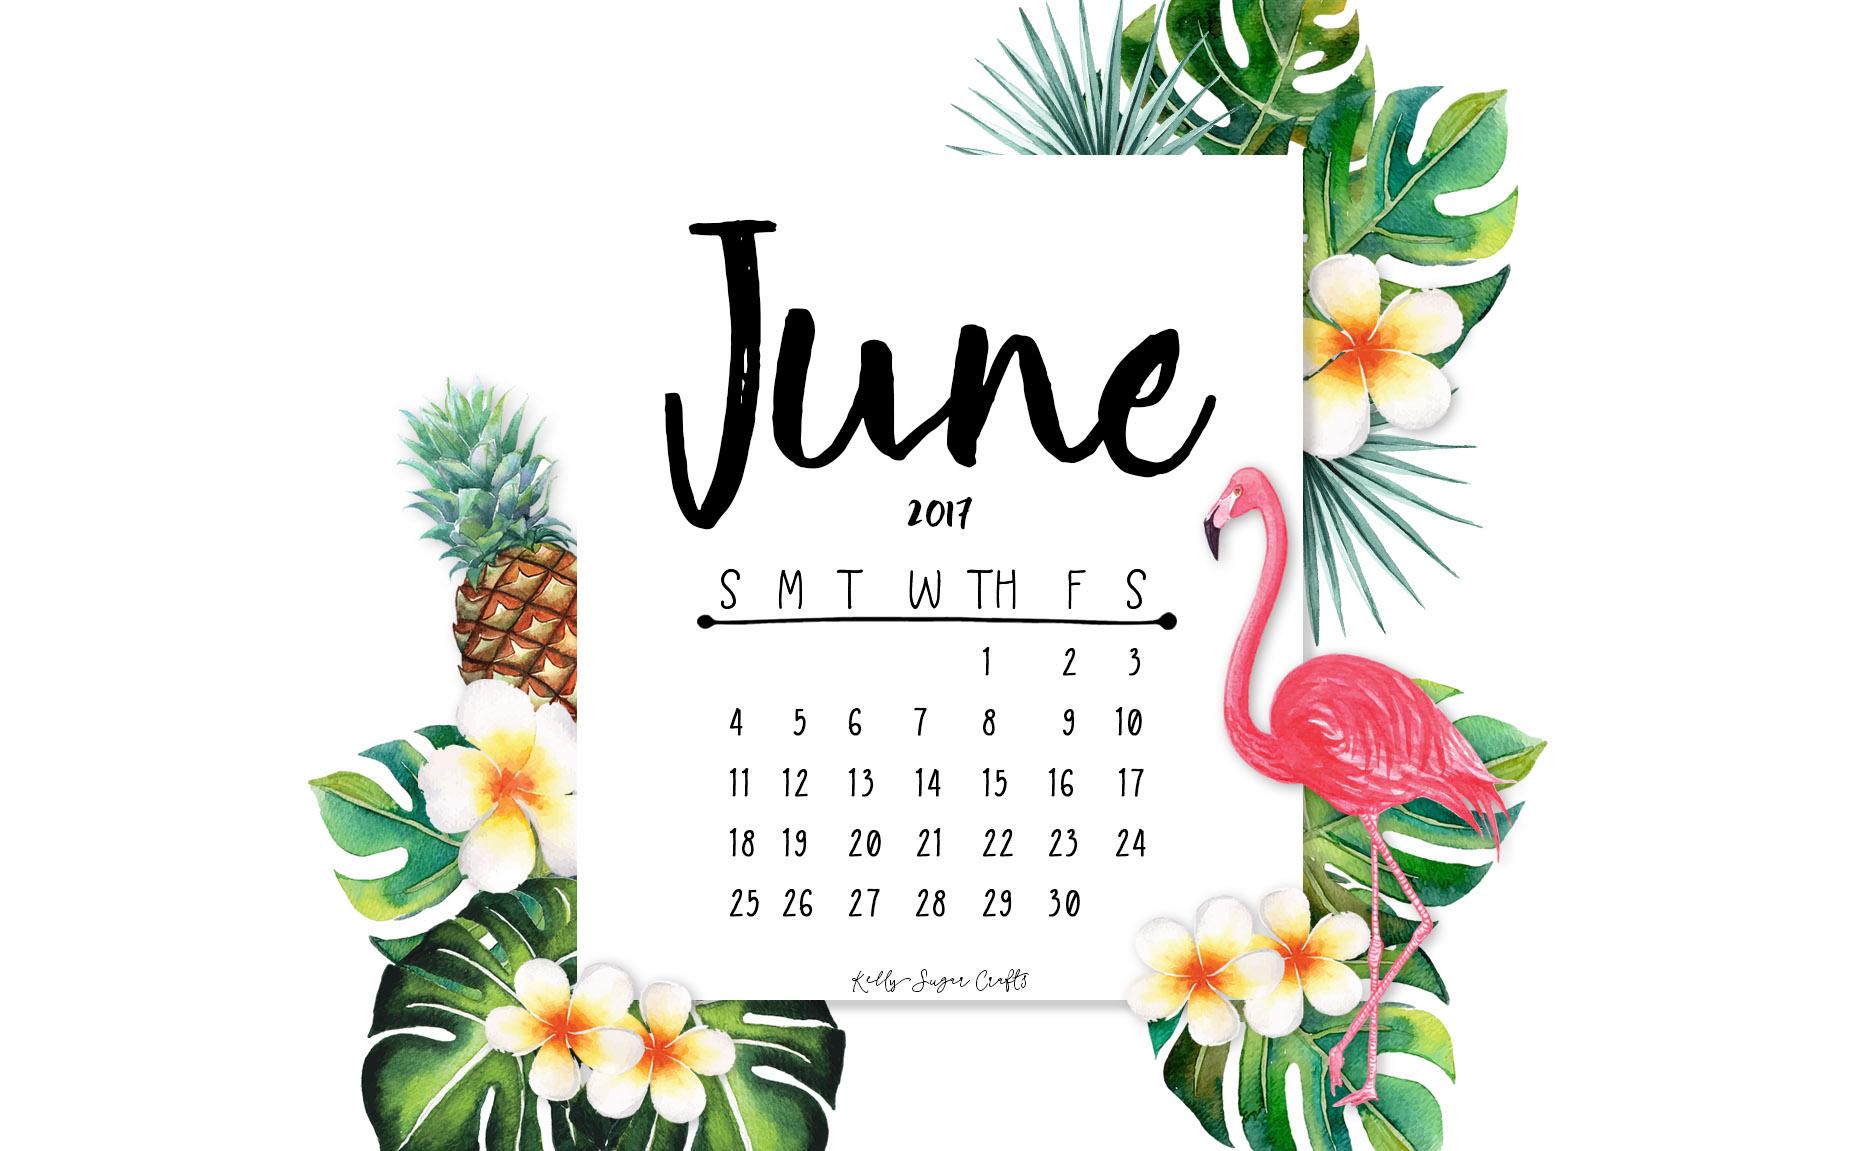 June 2017 Printable Calendar Wallpapers Kelly Sugar Crafts 1856x1151